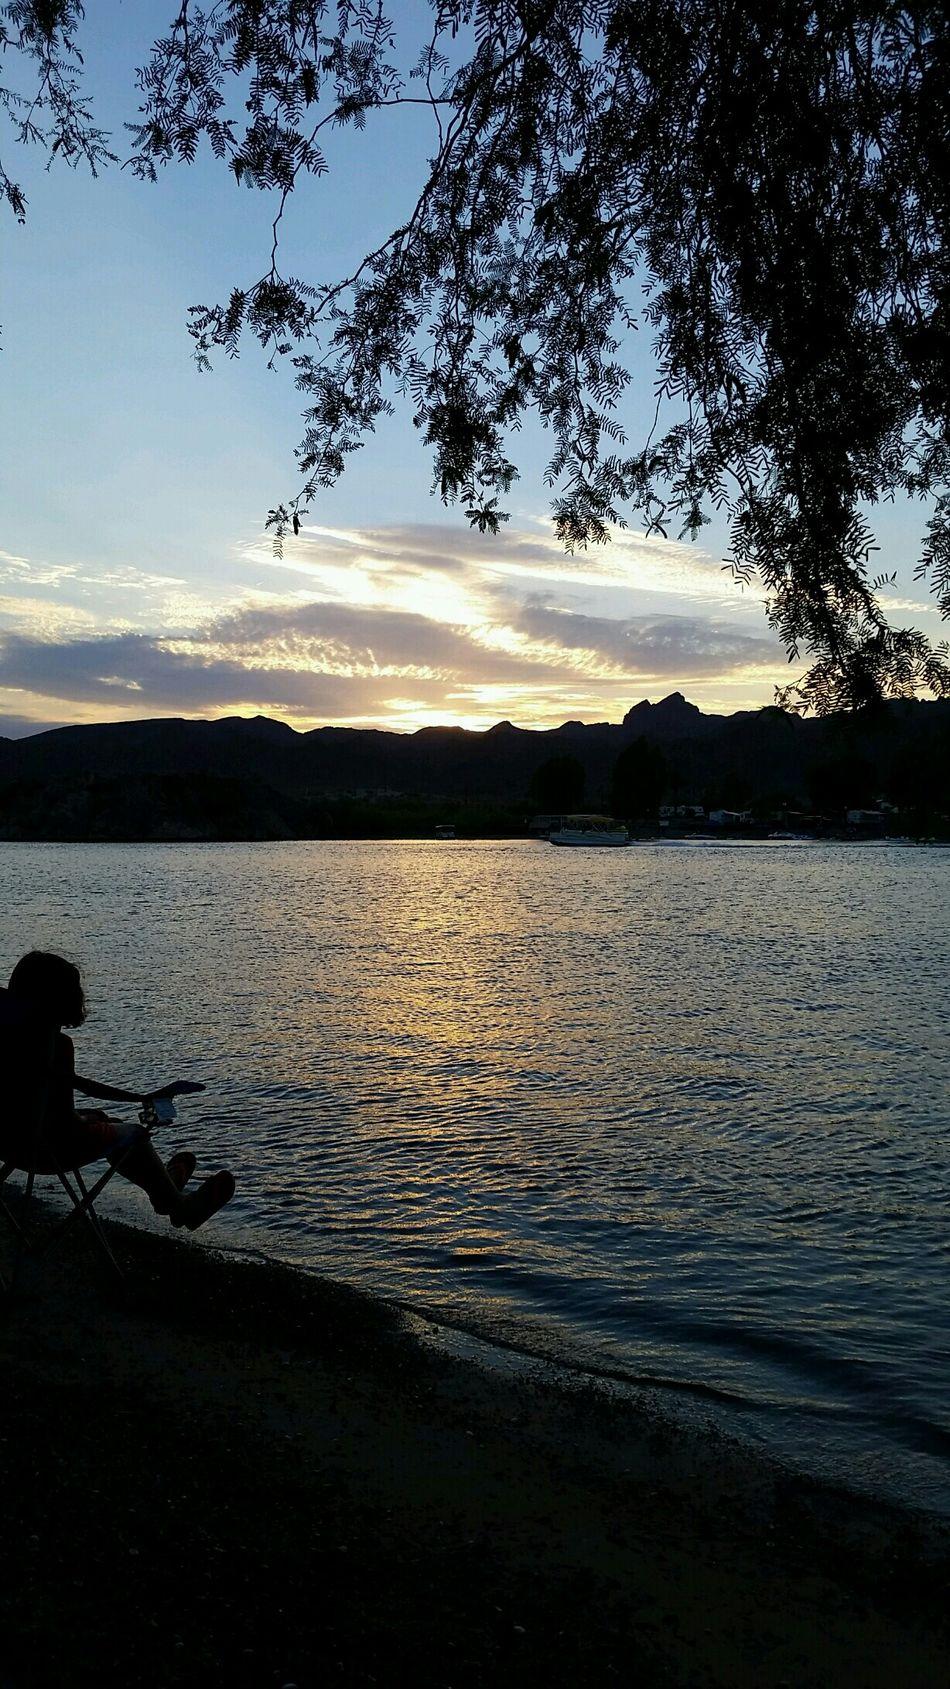 Buckskin Mountain State Park💕Vacation Summer2k15 Camping ParkerAz Thesunset . Nofilterneeded